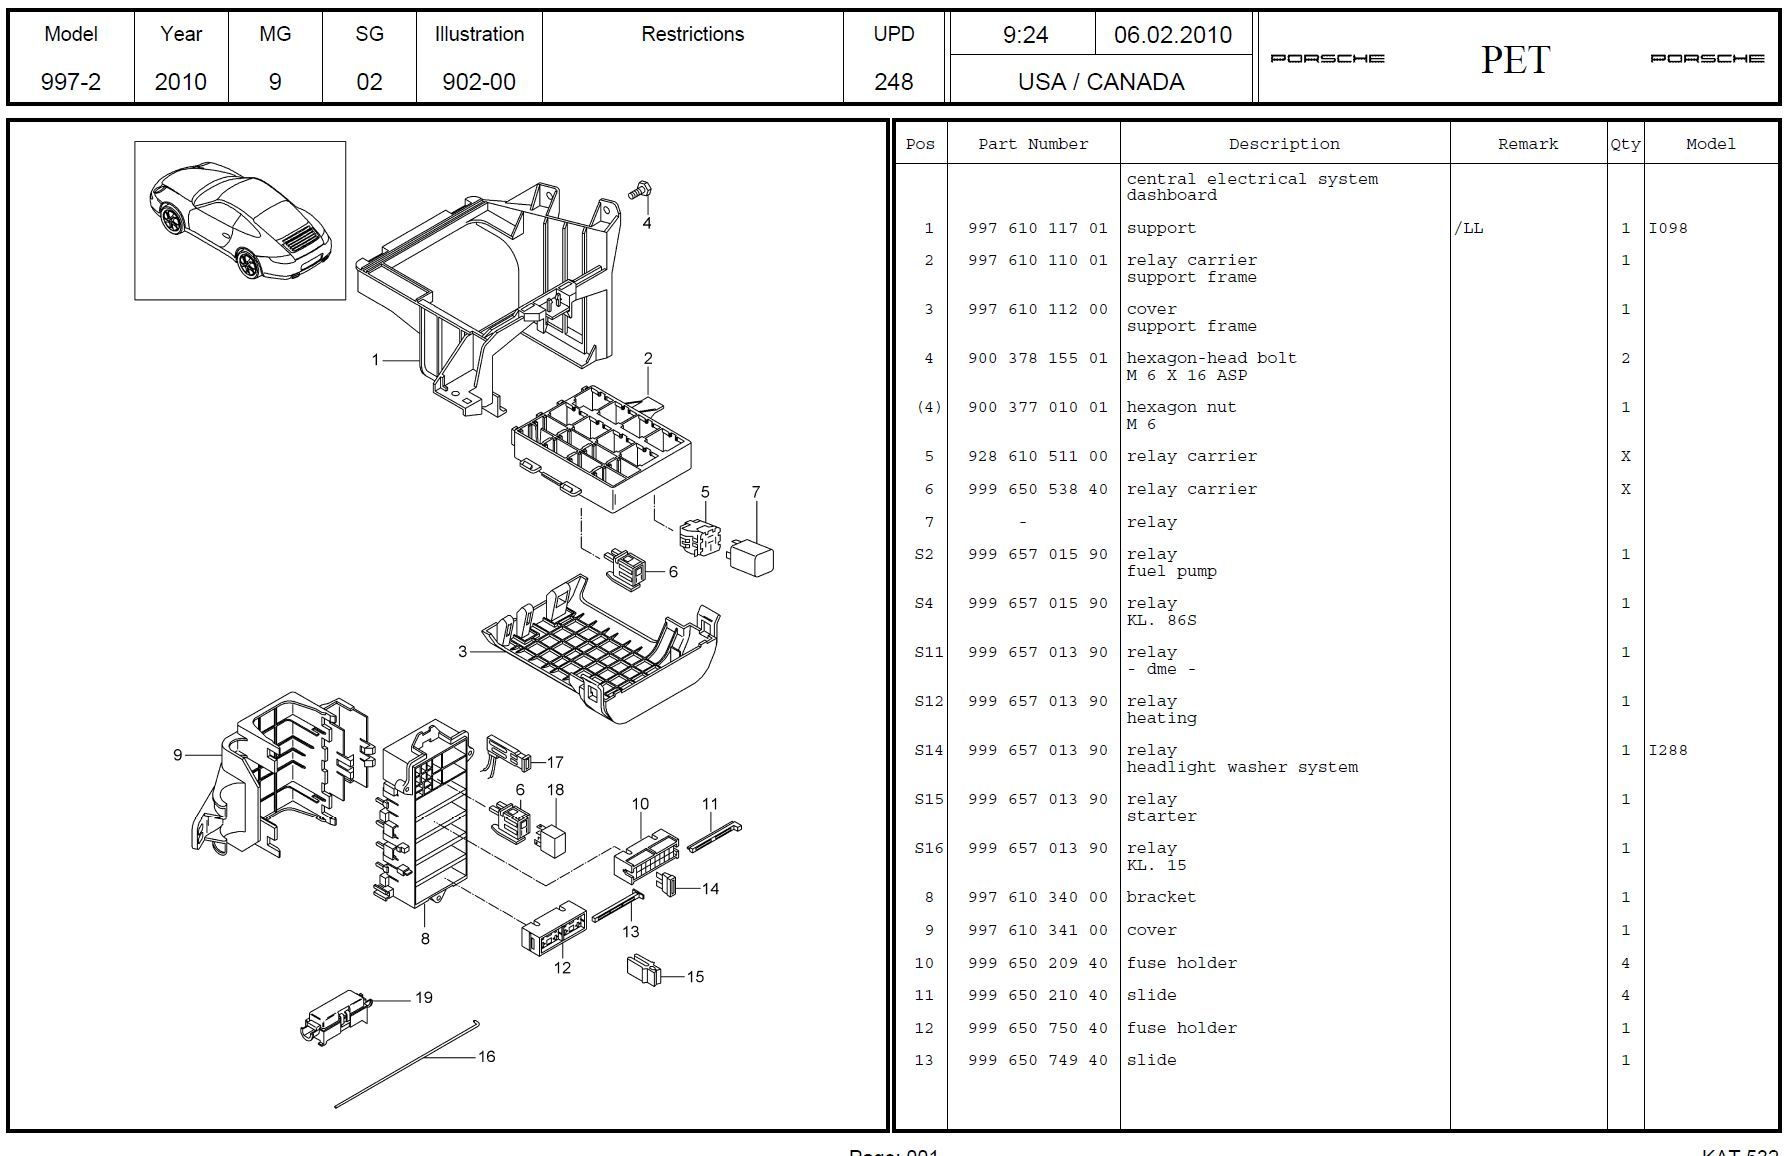 Diagram Mazda 6 2005 Wiring Diagram Full Version Hd Quality Wiring Diagram Diagramwillyi Portaimprese It